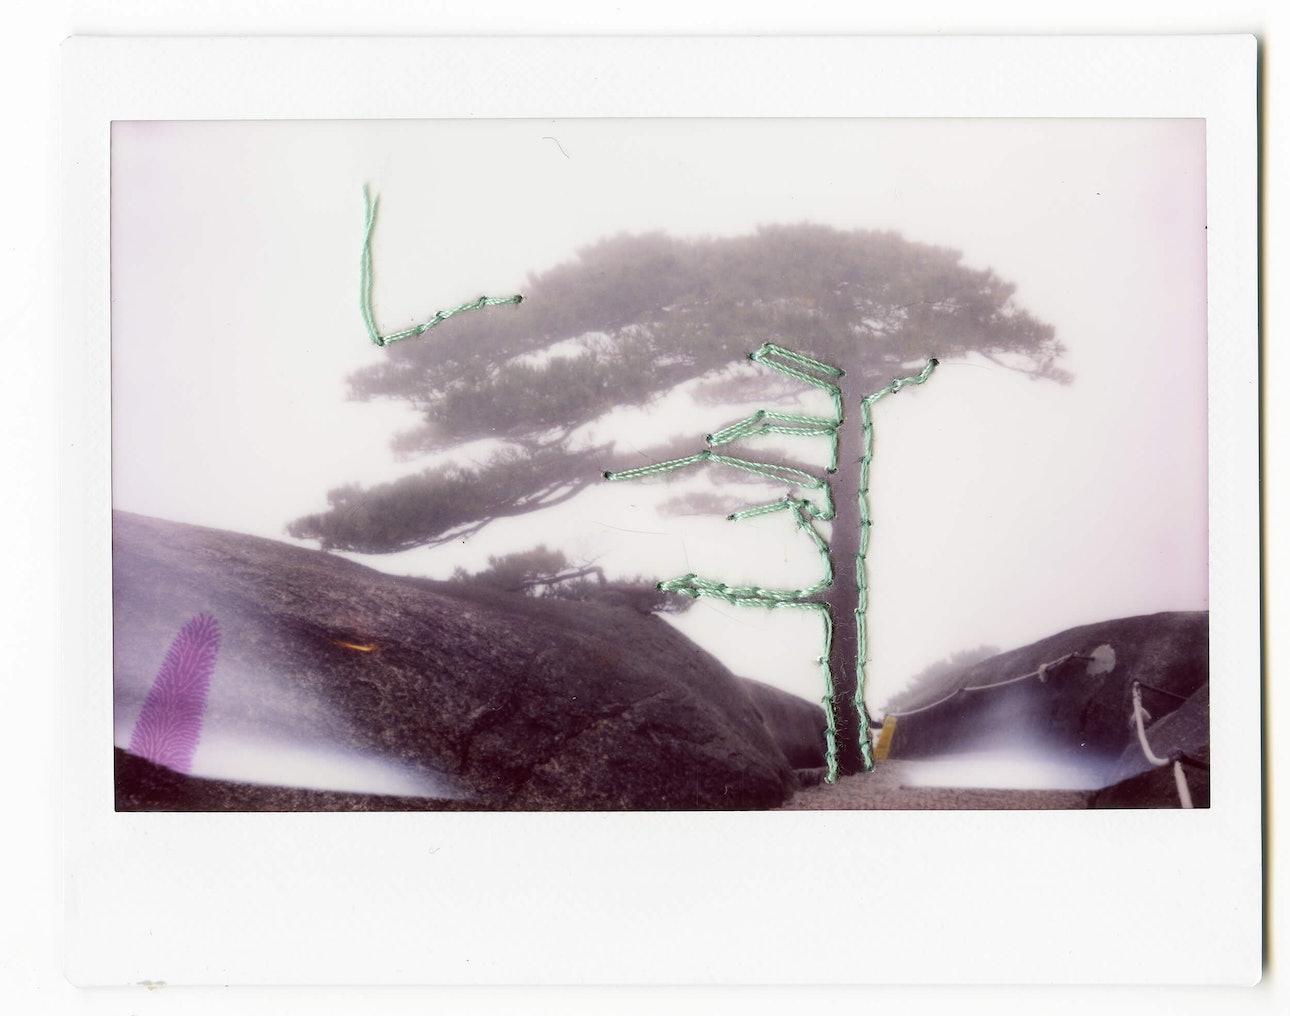 polaroid_057 copy